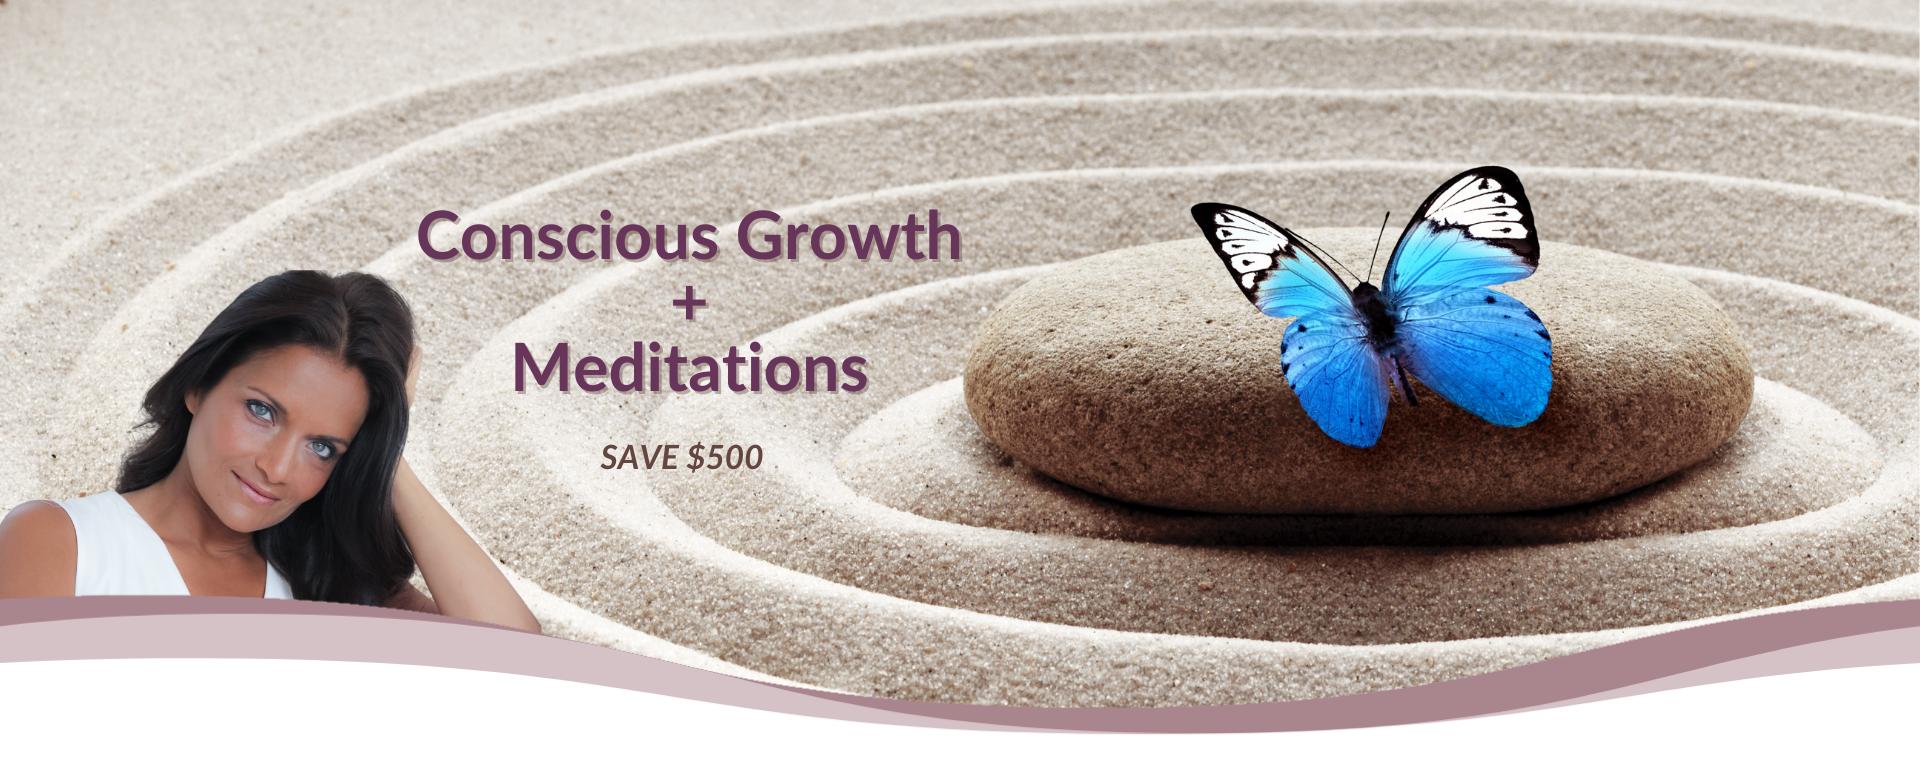 Conscious Growth + Meditations